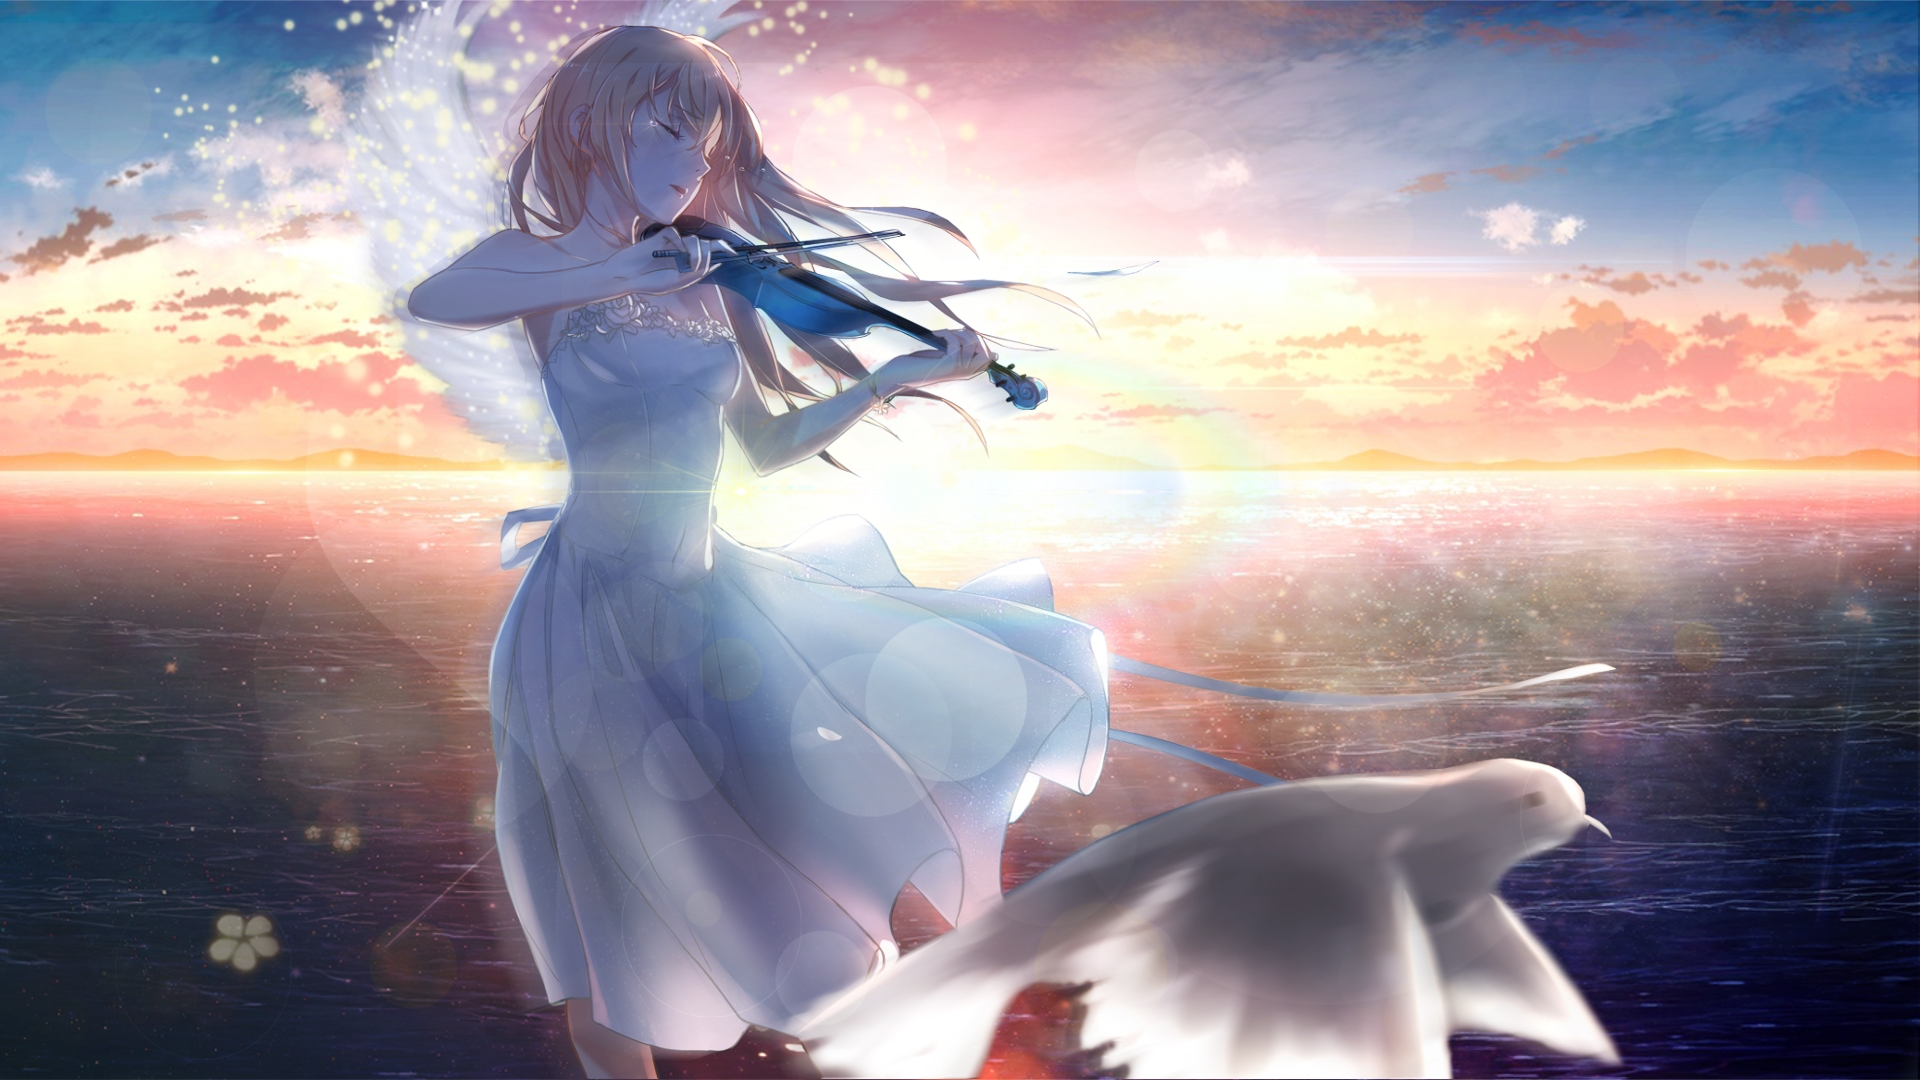 Desktop Wallpaper Kaori Miyazono, Anime Girl, Playing ...